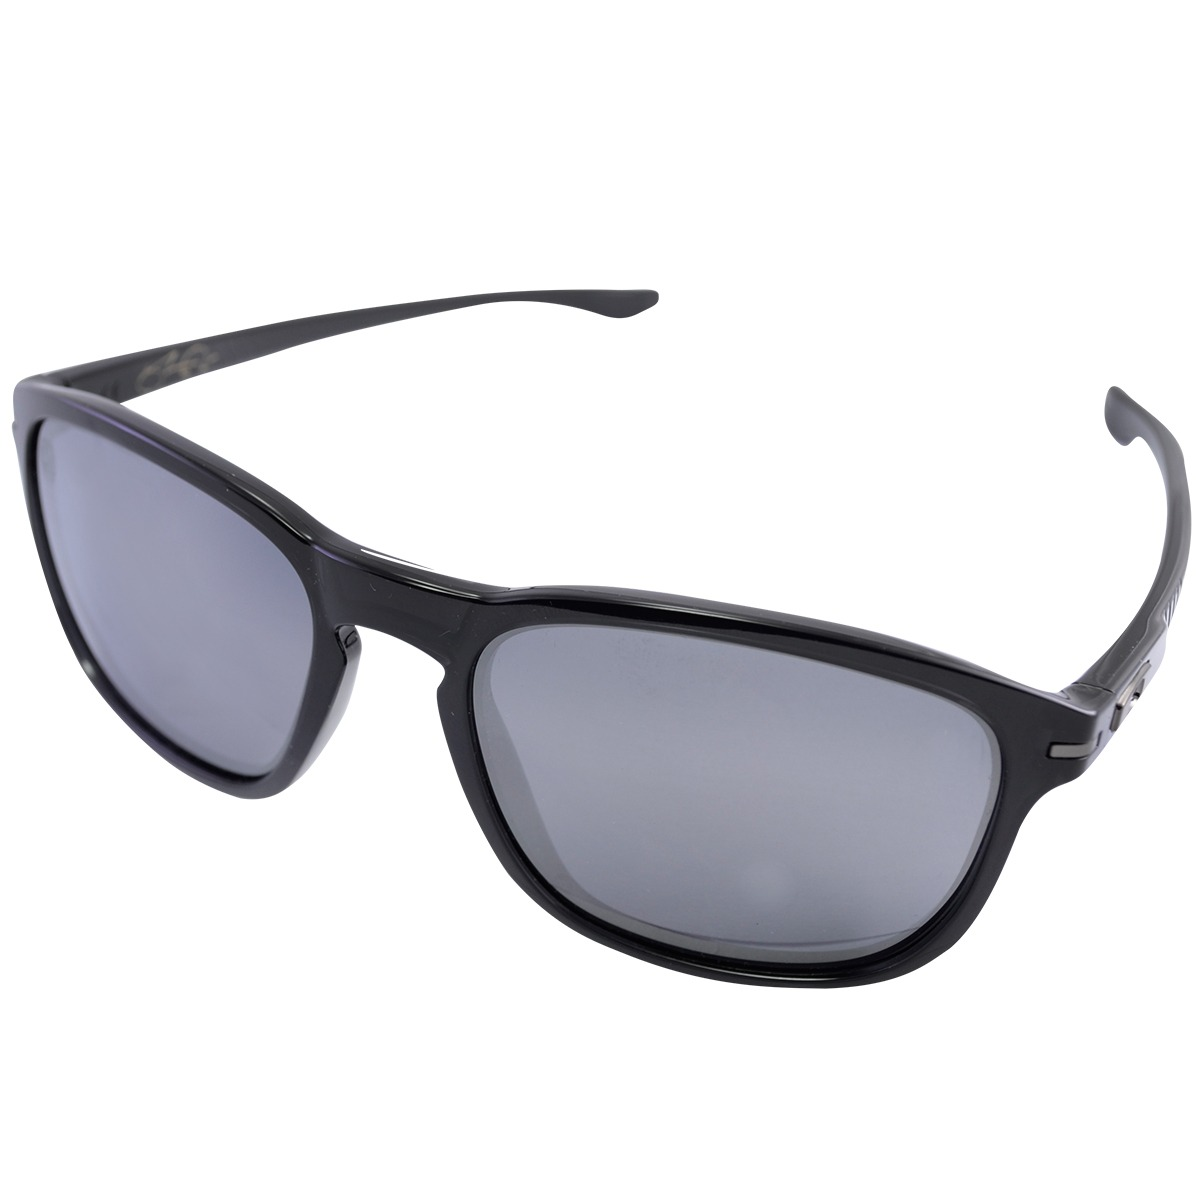 89c6cdeee Óculos Oakley Enduro - R$ 469,90 em Mercado Livre